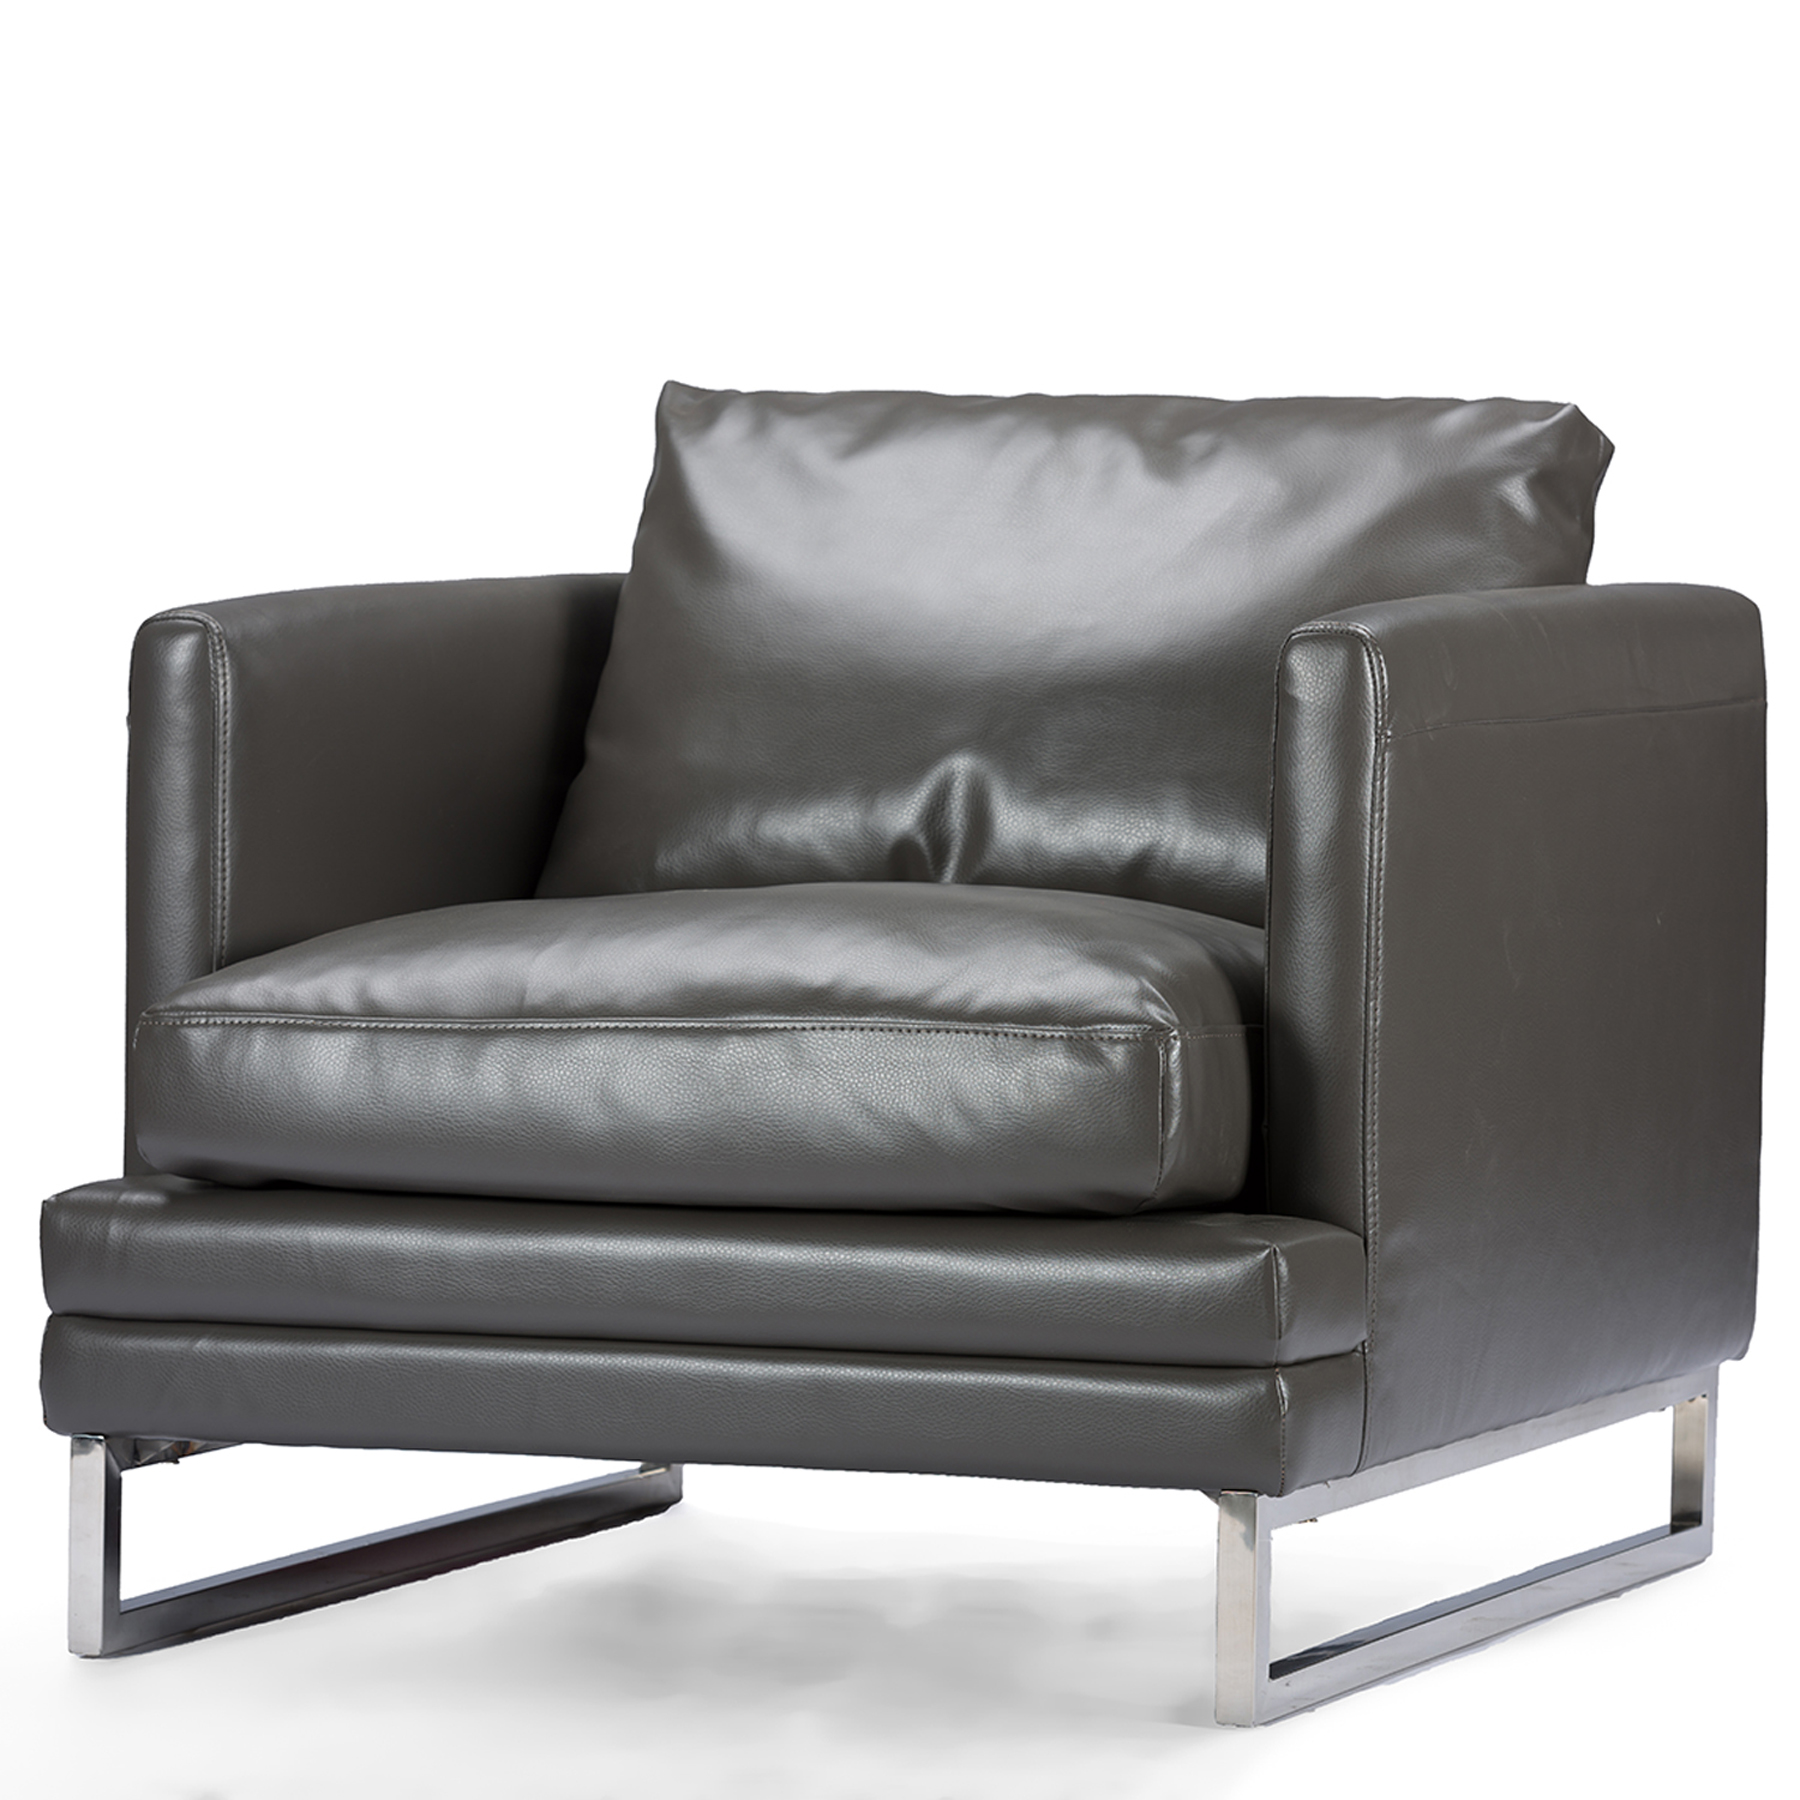 Baxton Studio Dakota Pewter Gray Leather Modern Chair PartNumber: 00816070000P KsnValue: 00816070000 MfgPartNumber: 1378-DU8145-Chair